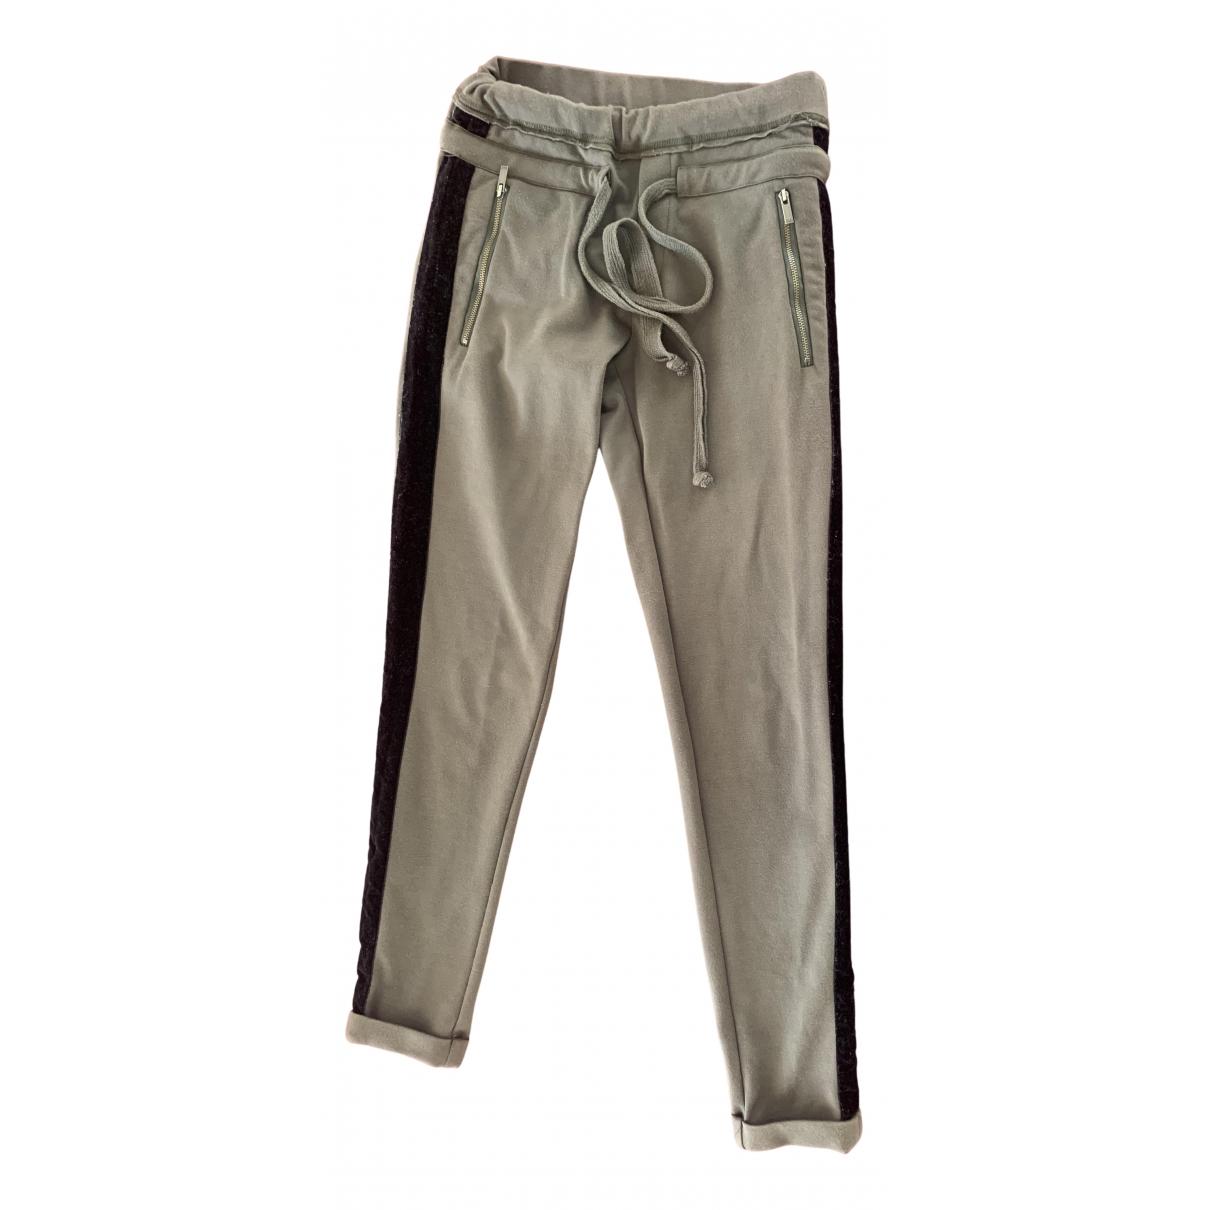 The Kooples Fall Winter 2019 Khaki Cotton Trousers for Women 38 FR